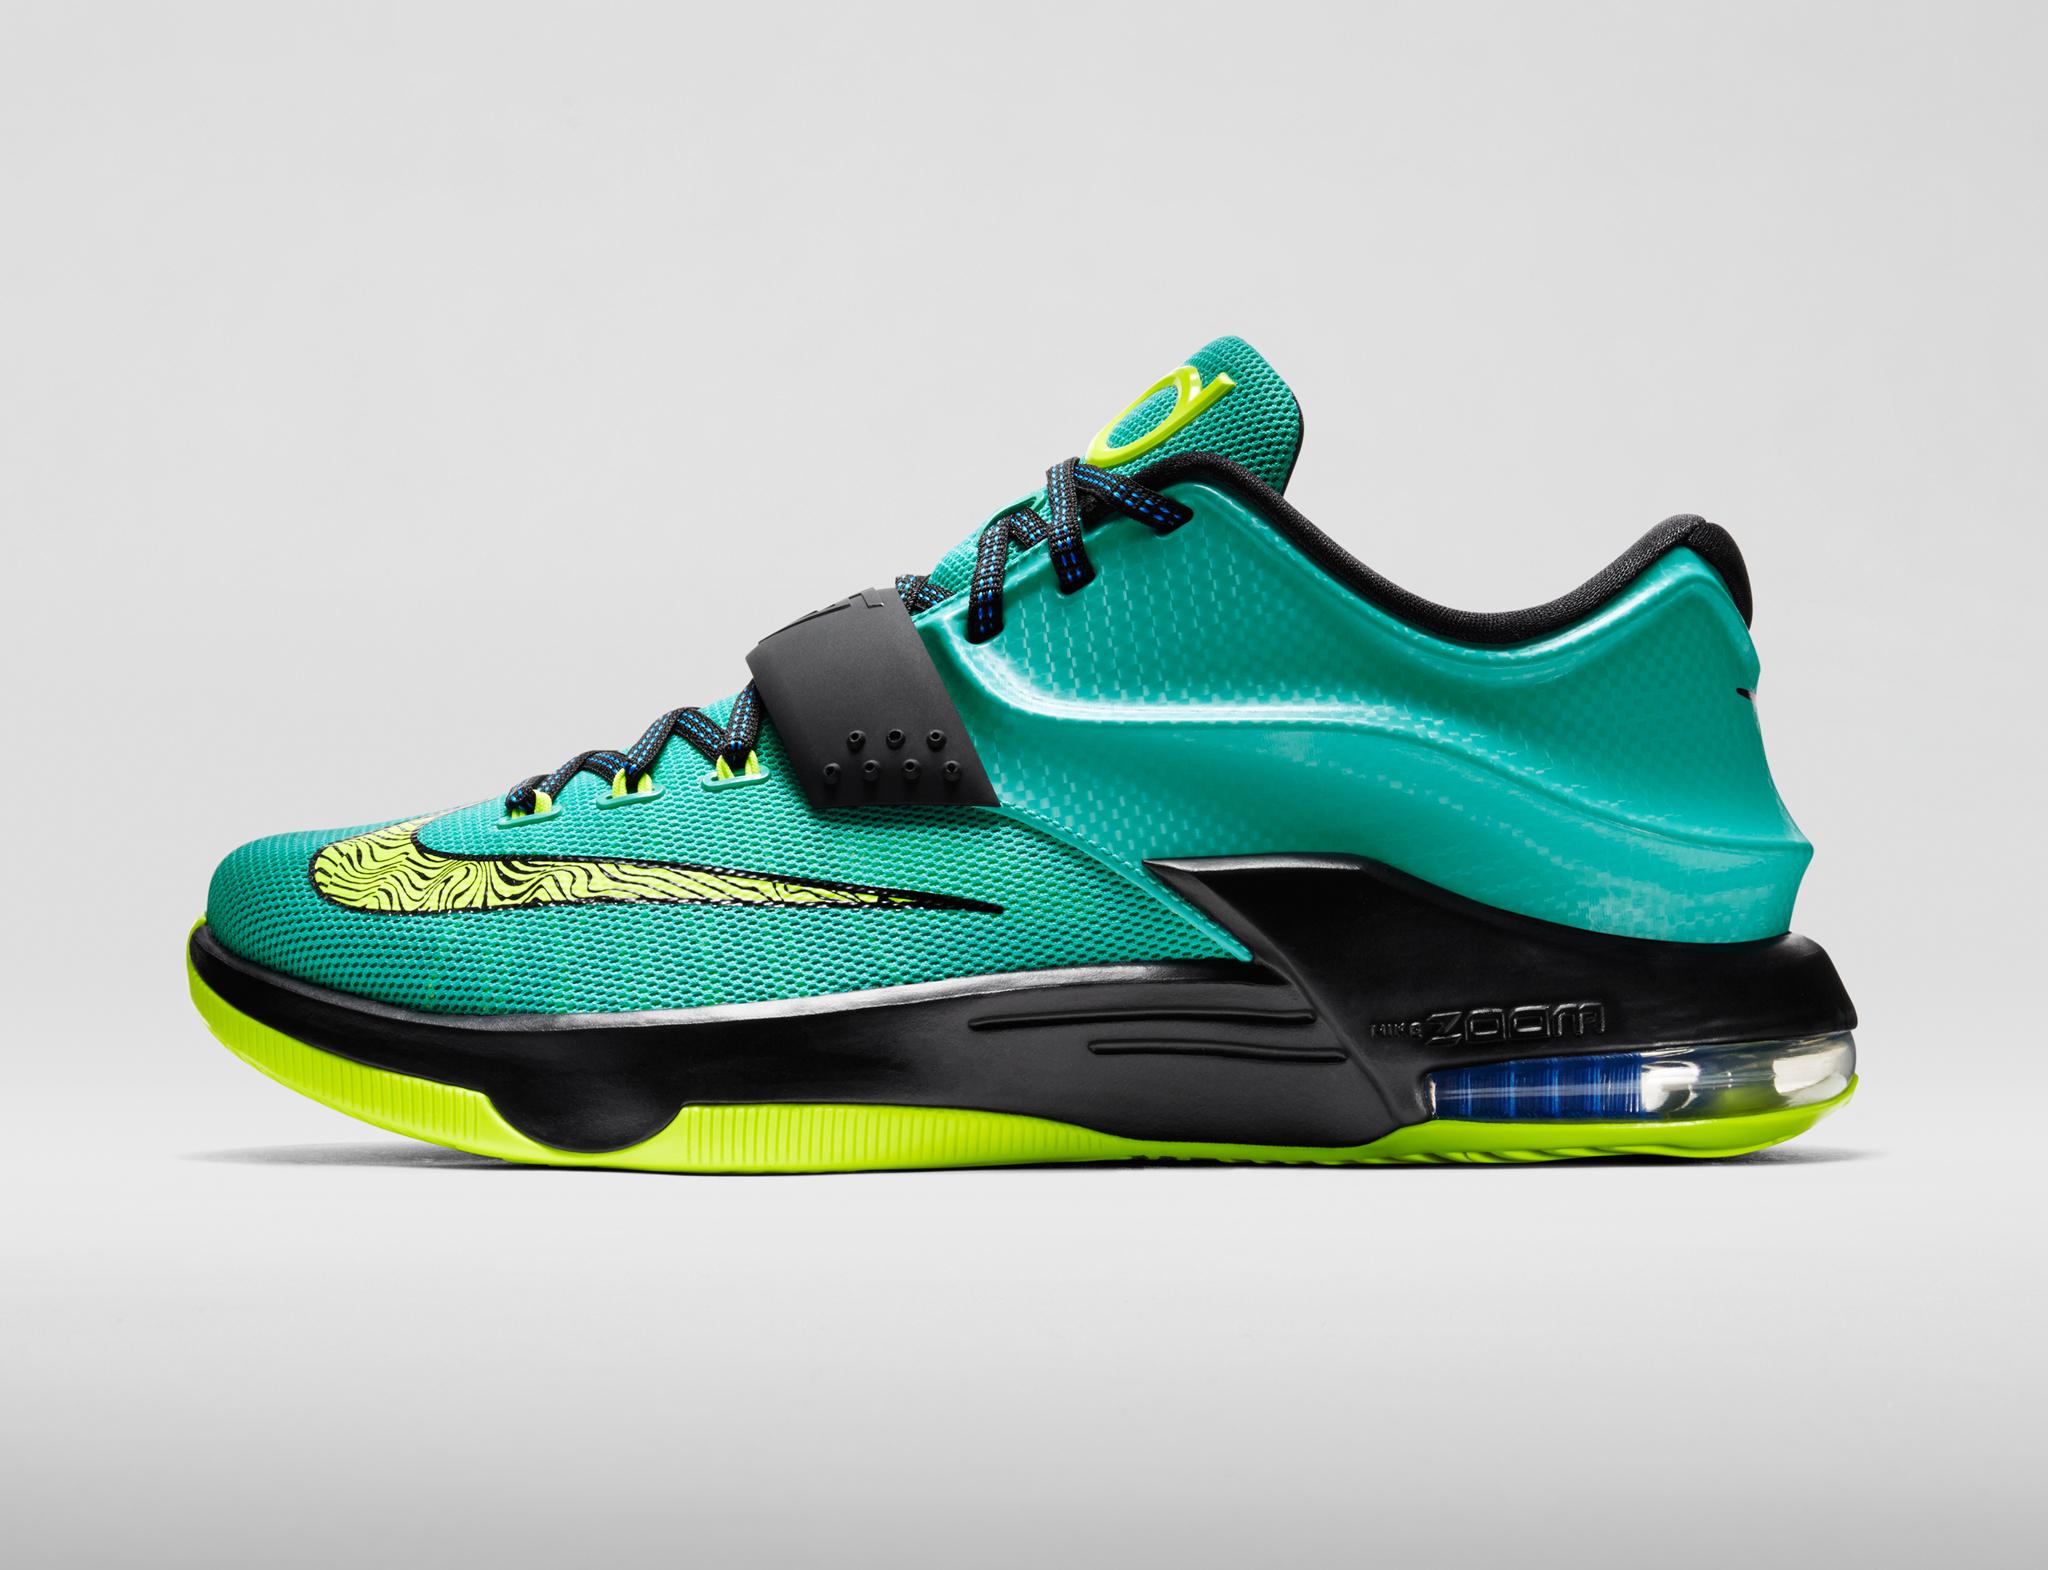 Nett Schuhe Nike Kd 7 Uprising